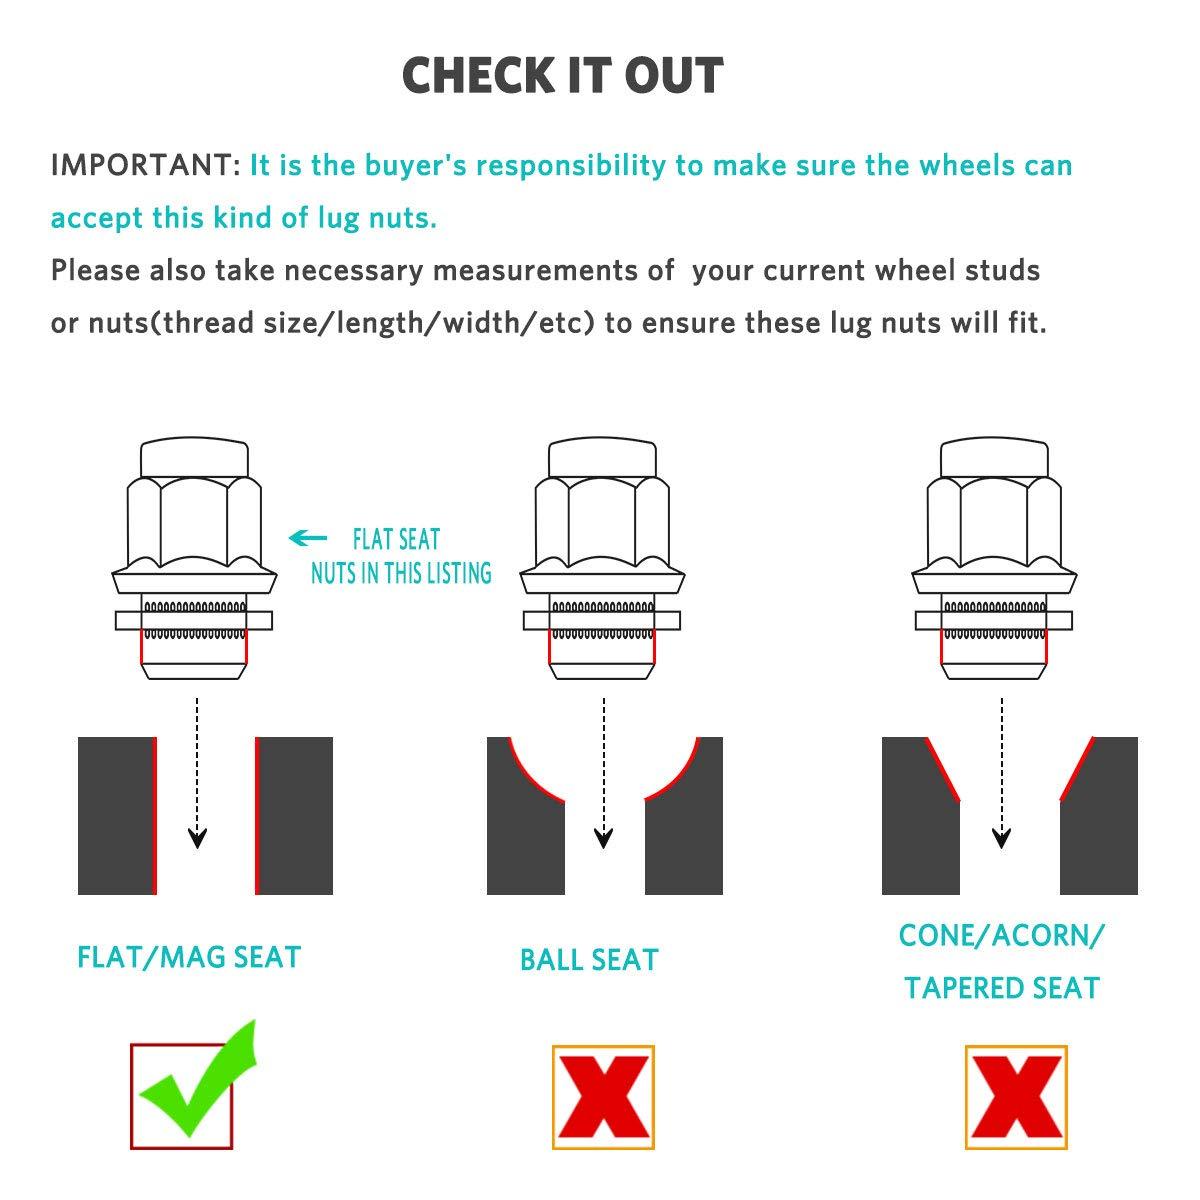 Maxiii Lug Nuts 14x1.5 20PCS Chrome Mag Seat Compatible for Land Rover Range Rover Lexus LX470 LX570 Toyota Tundra Sequoia Land Cruiser